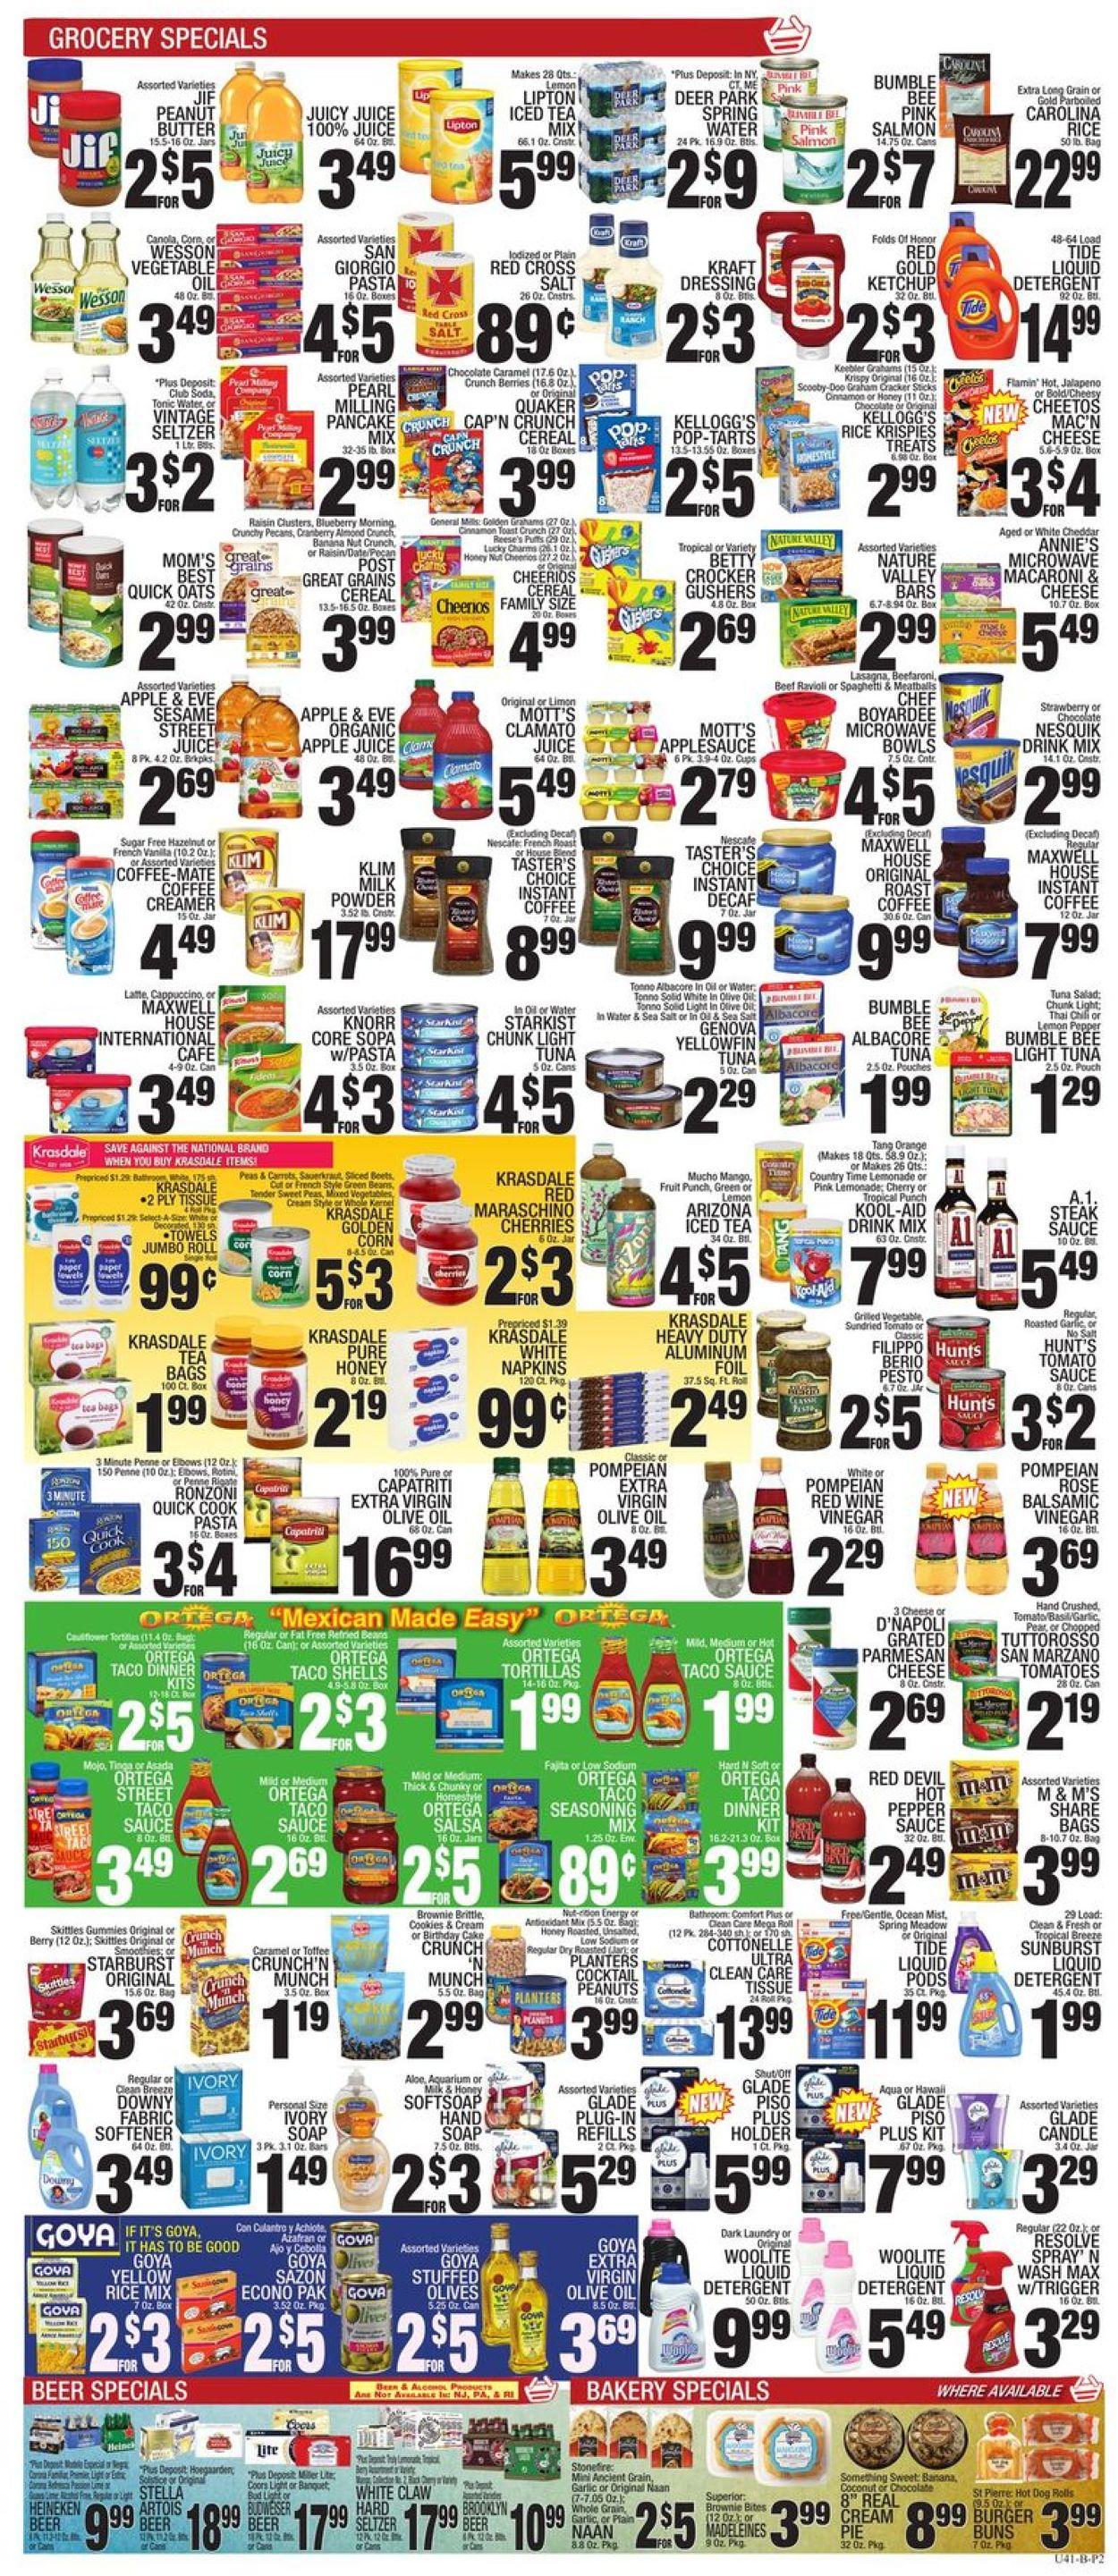 C-Town Weekly Ad Circular - valid 07/23-07/29/2021 (Page 2)